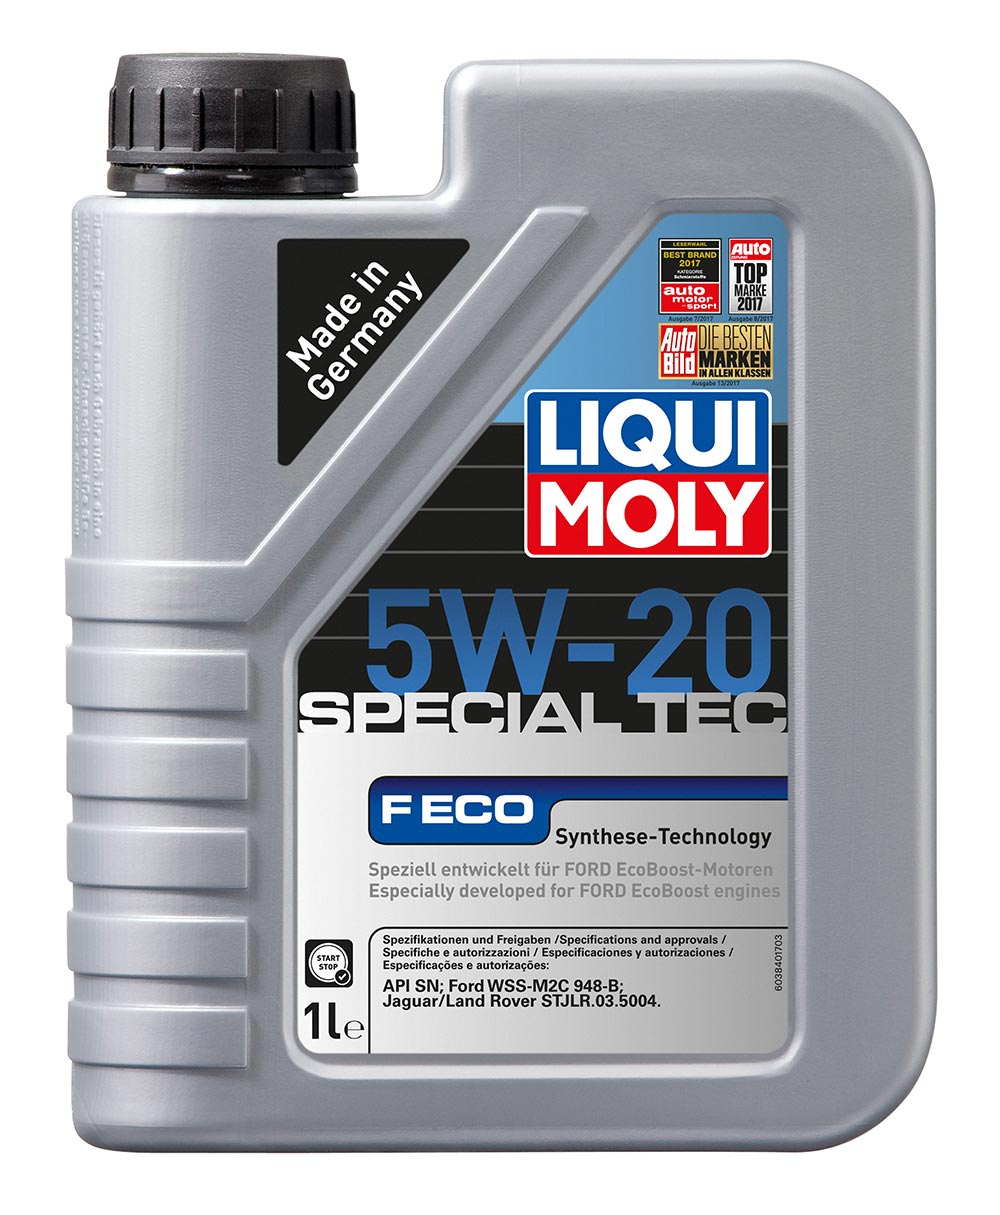 Масло моторное синт. 5W20 Special Tес F ECO 1л ACEA C5 API SN Ford WSS